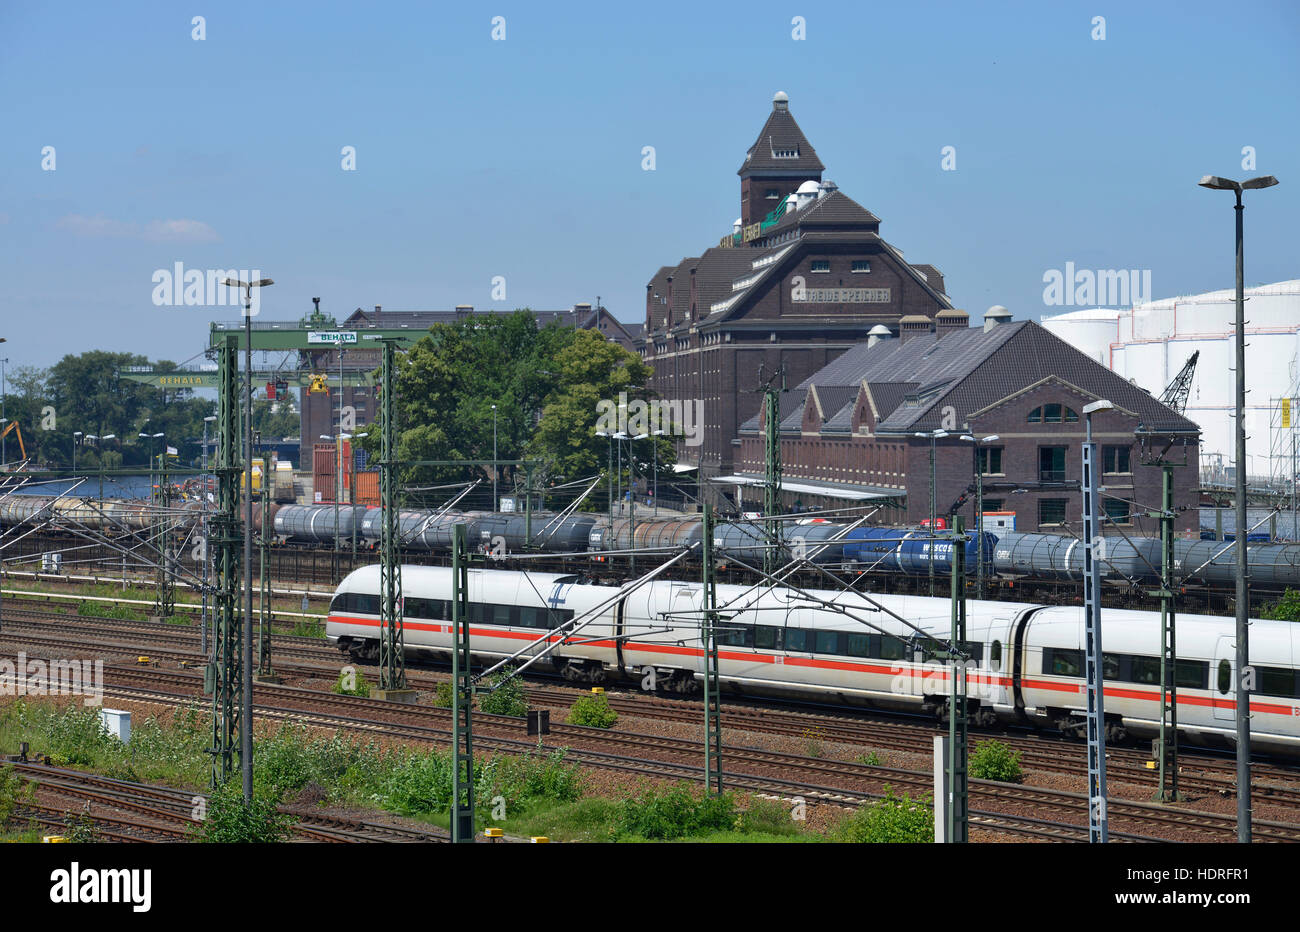 ICE, Lagerhaus, Behala, Westhafen, Moabit, Berlin, Deutschland Stock Photo